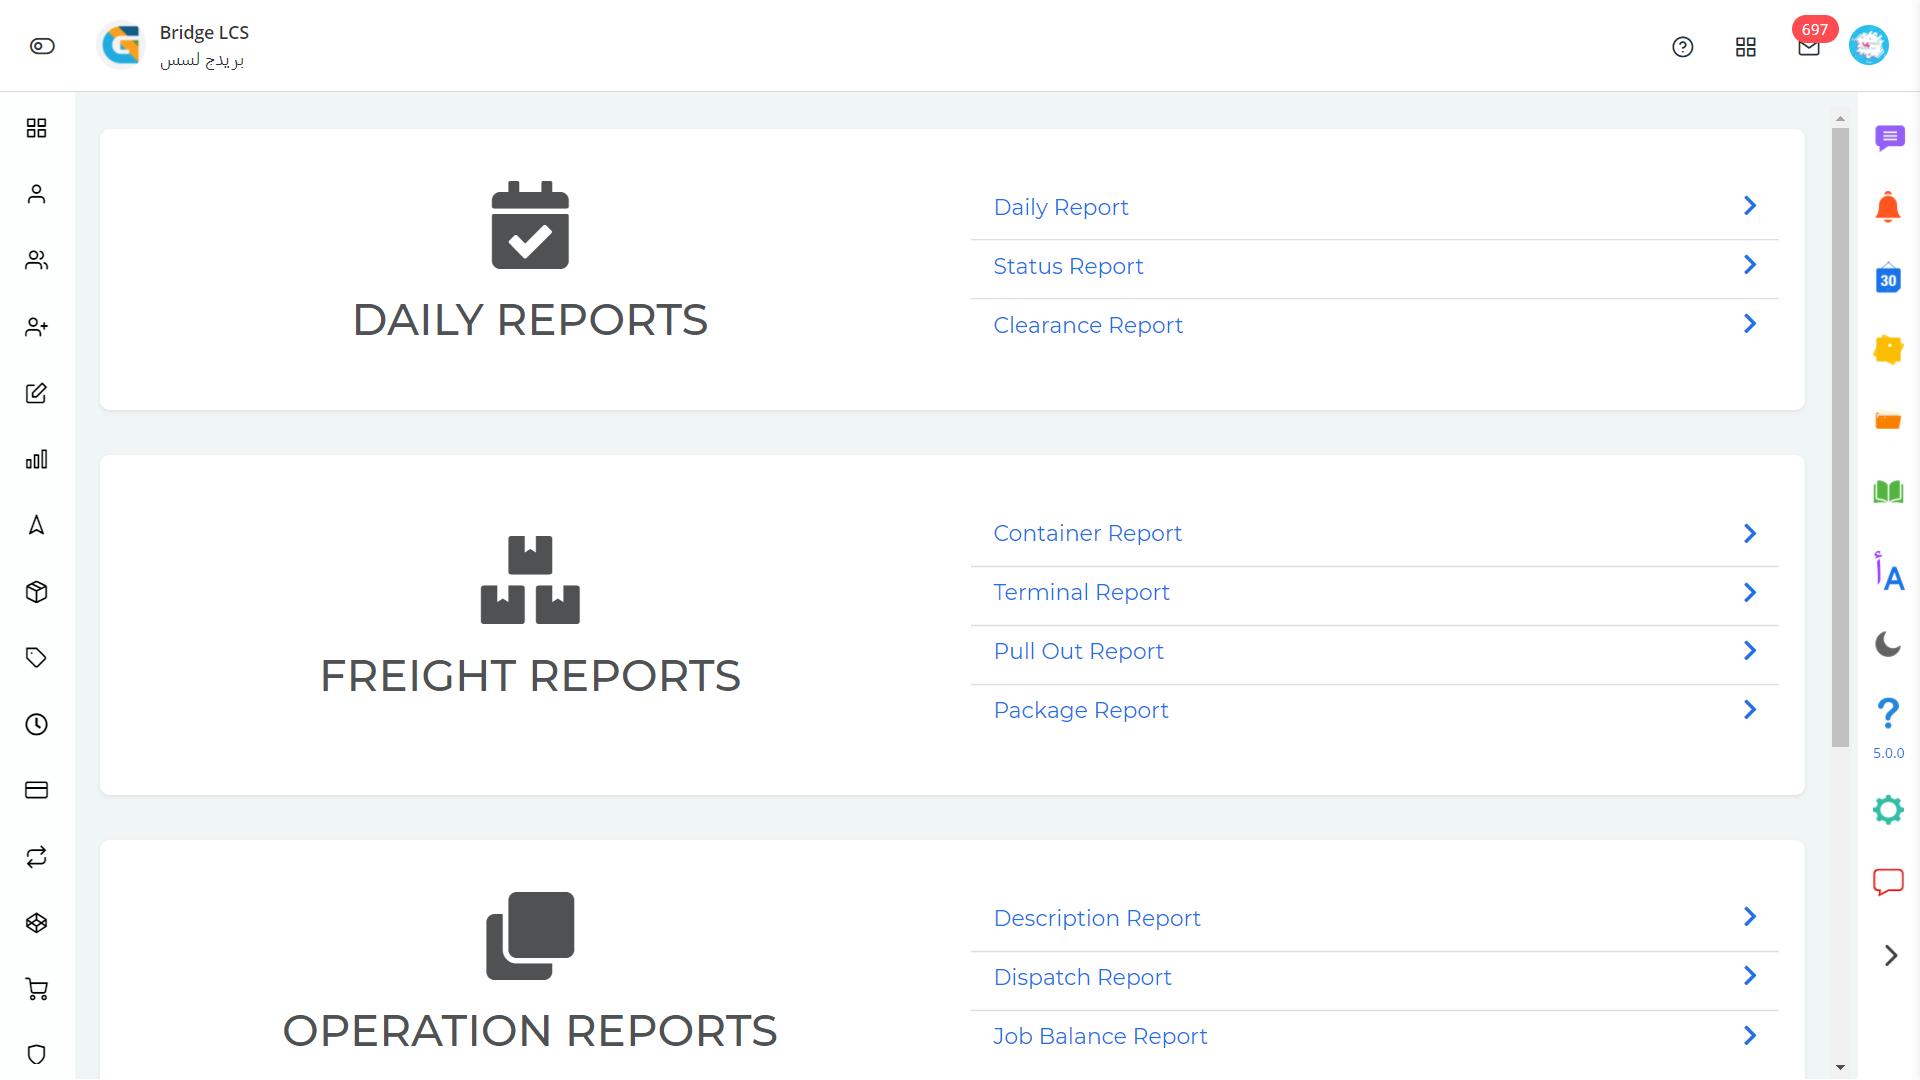 Operation report logistics software